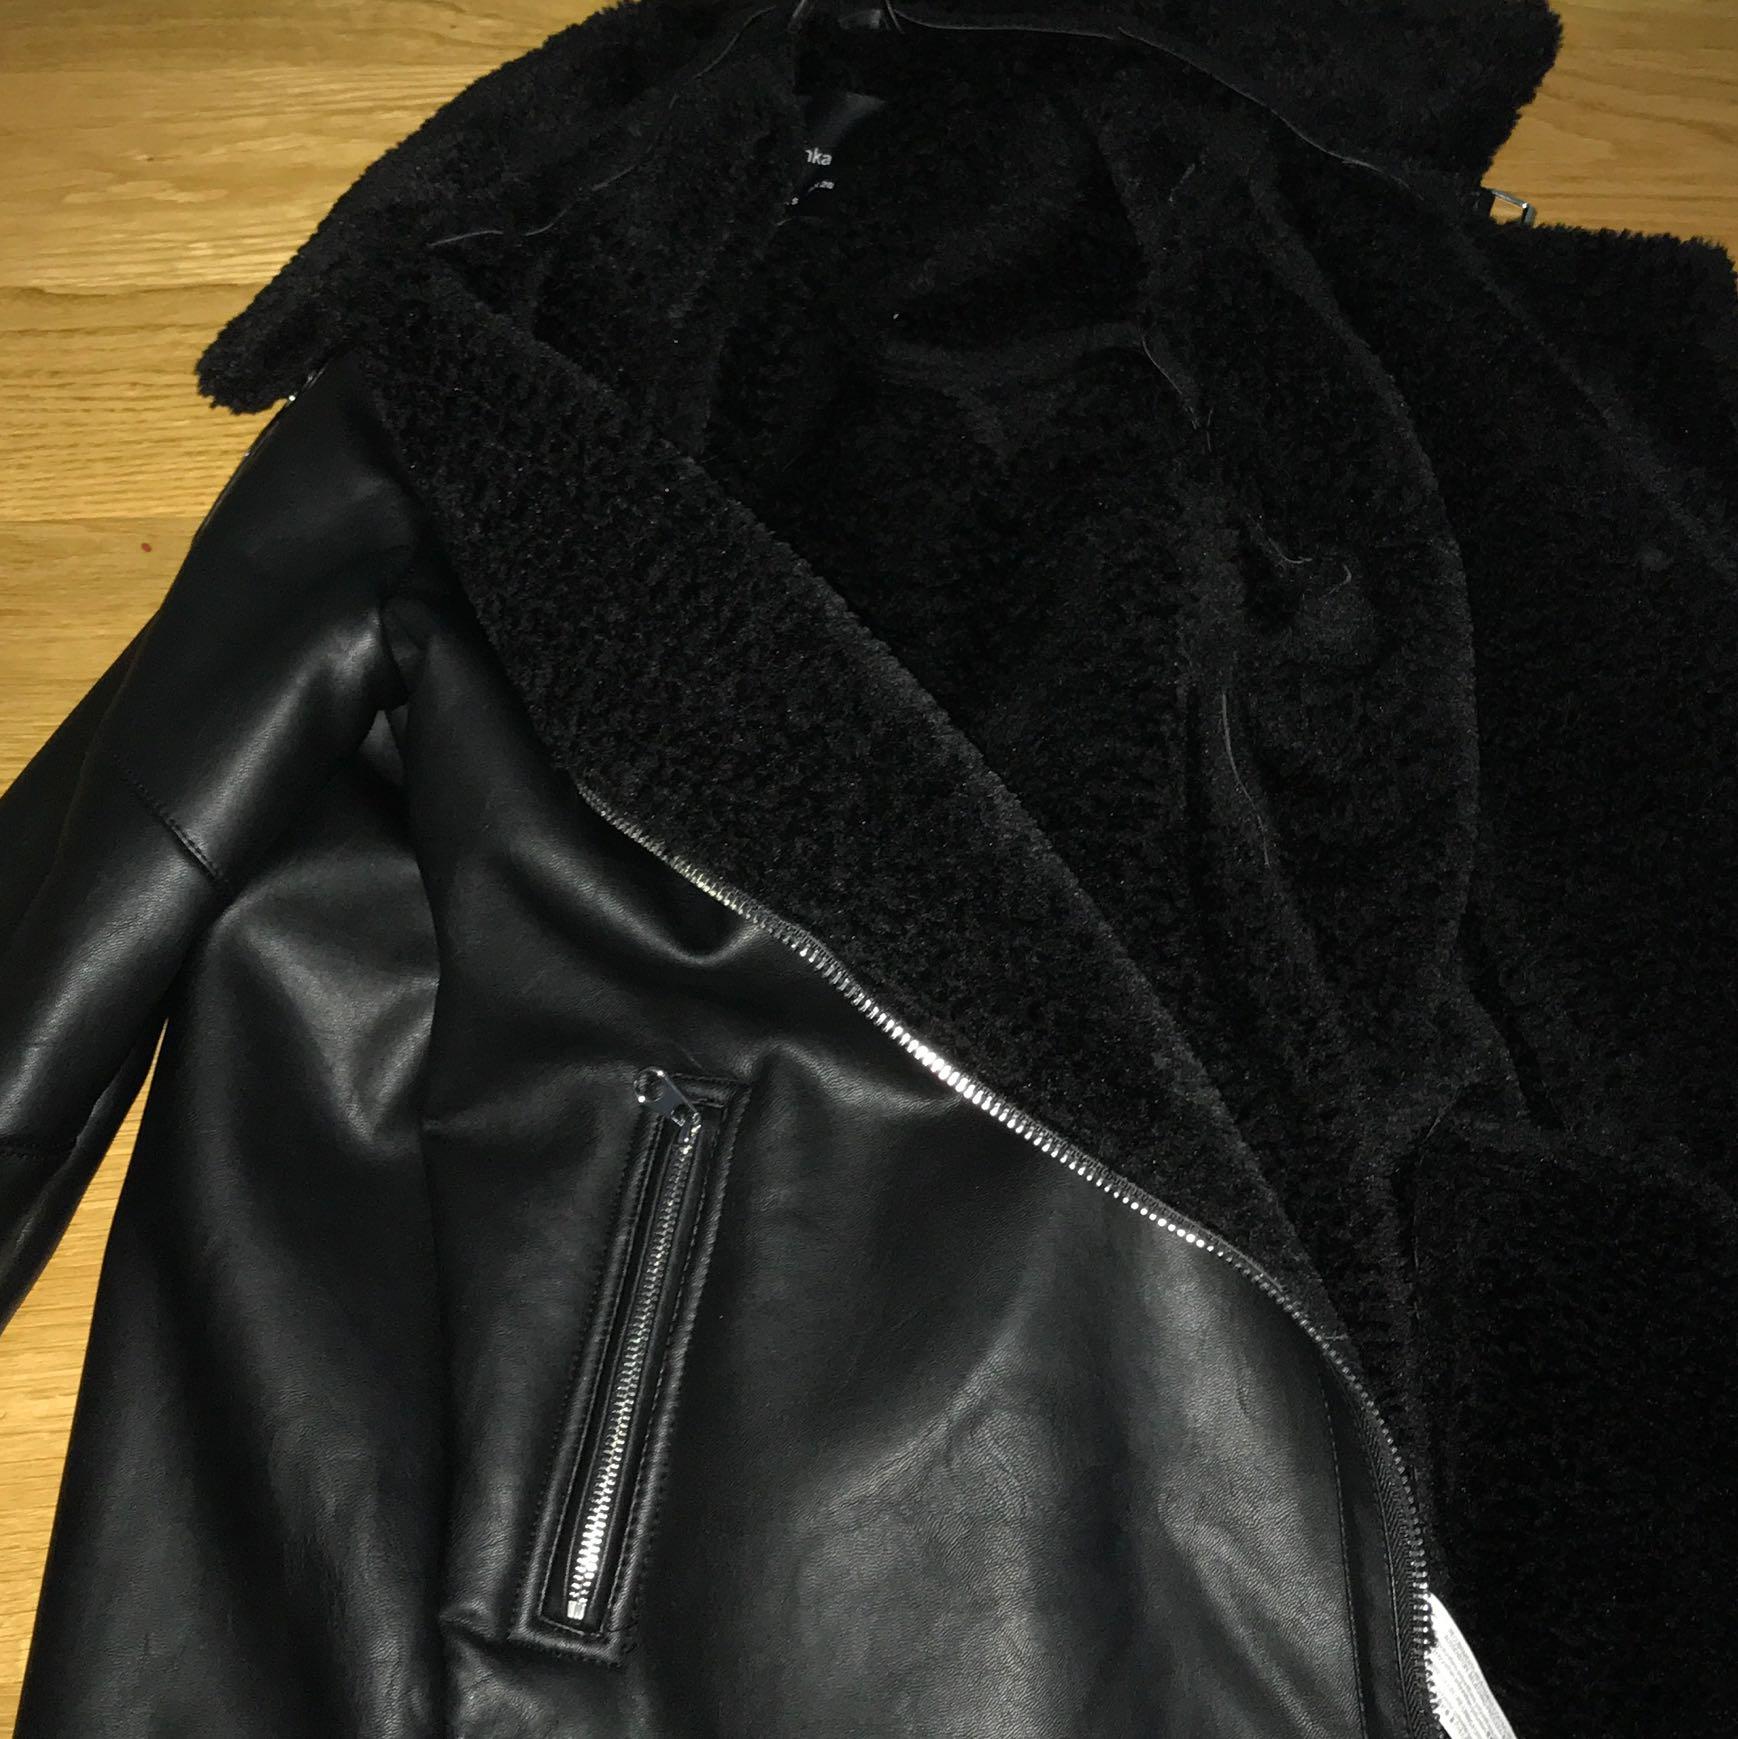 Lederjacke mit Fell in Waschmaschine? (Jacke, Reinigung, Geruch)